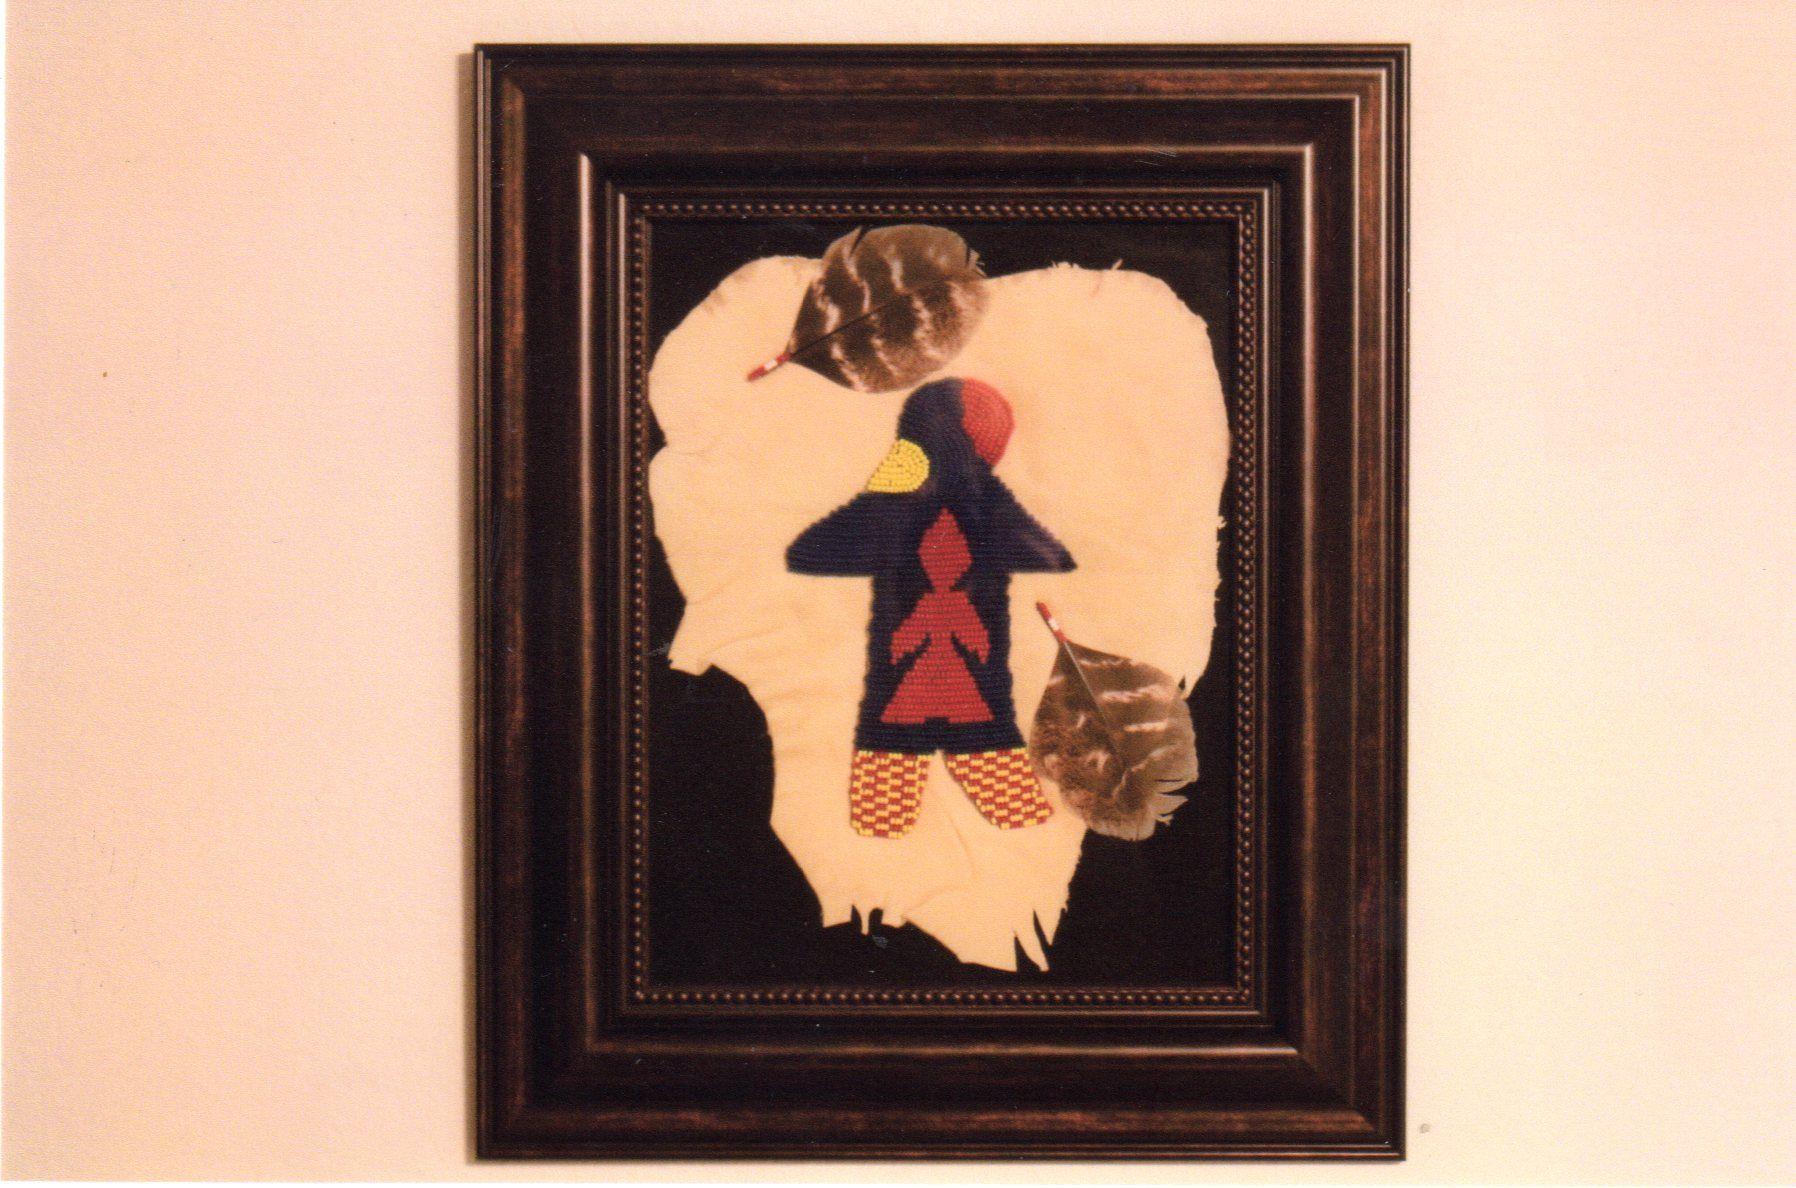 Hand beaded bear figure on leather, with wild turkey feather decoration -- framed. Karen. A. Holt, artist